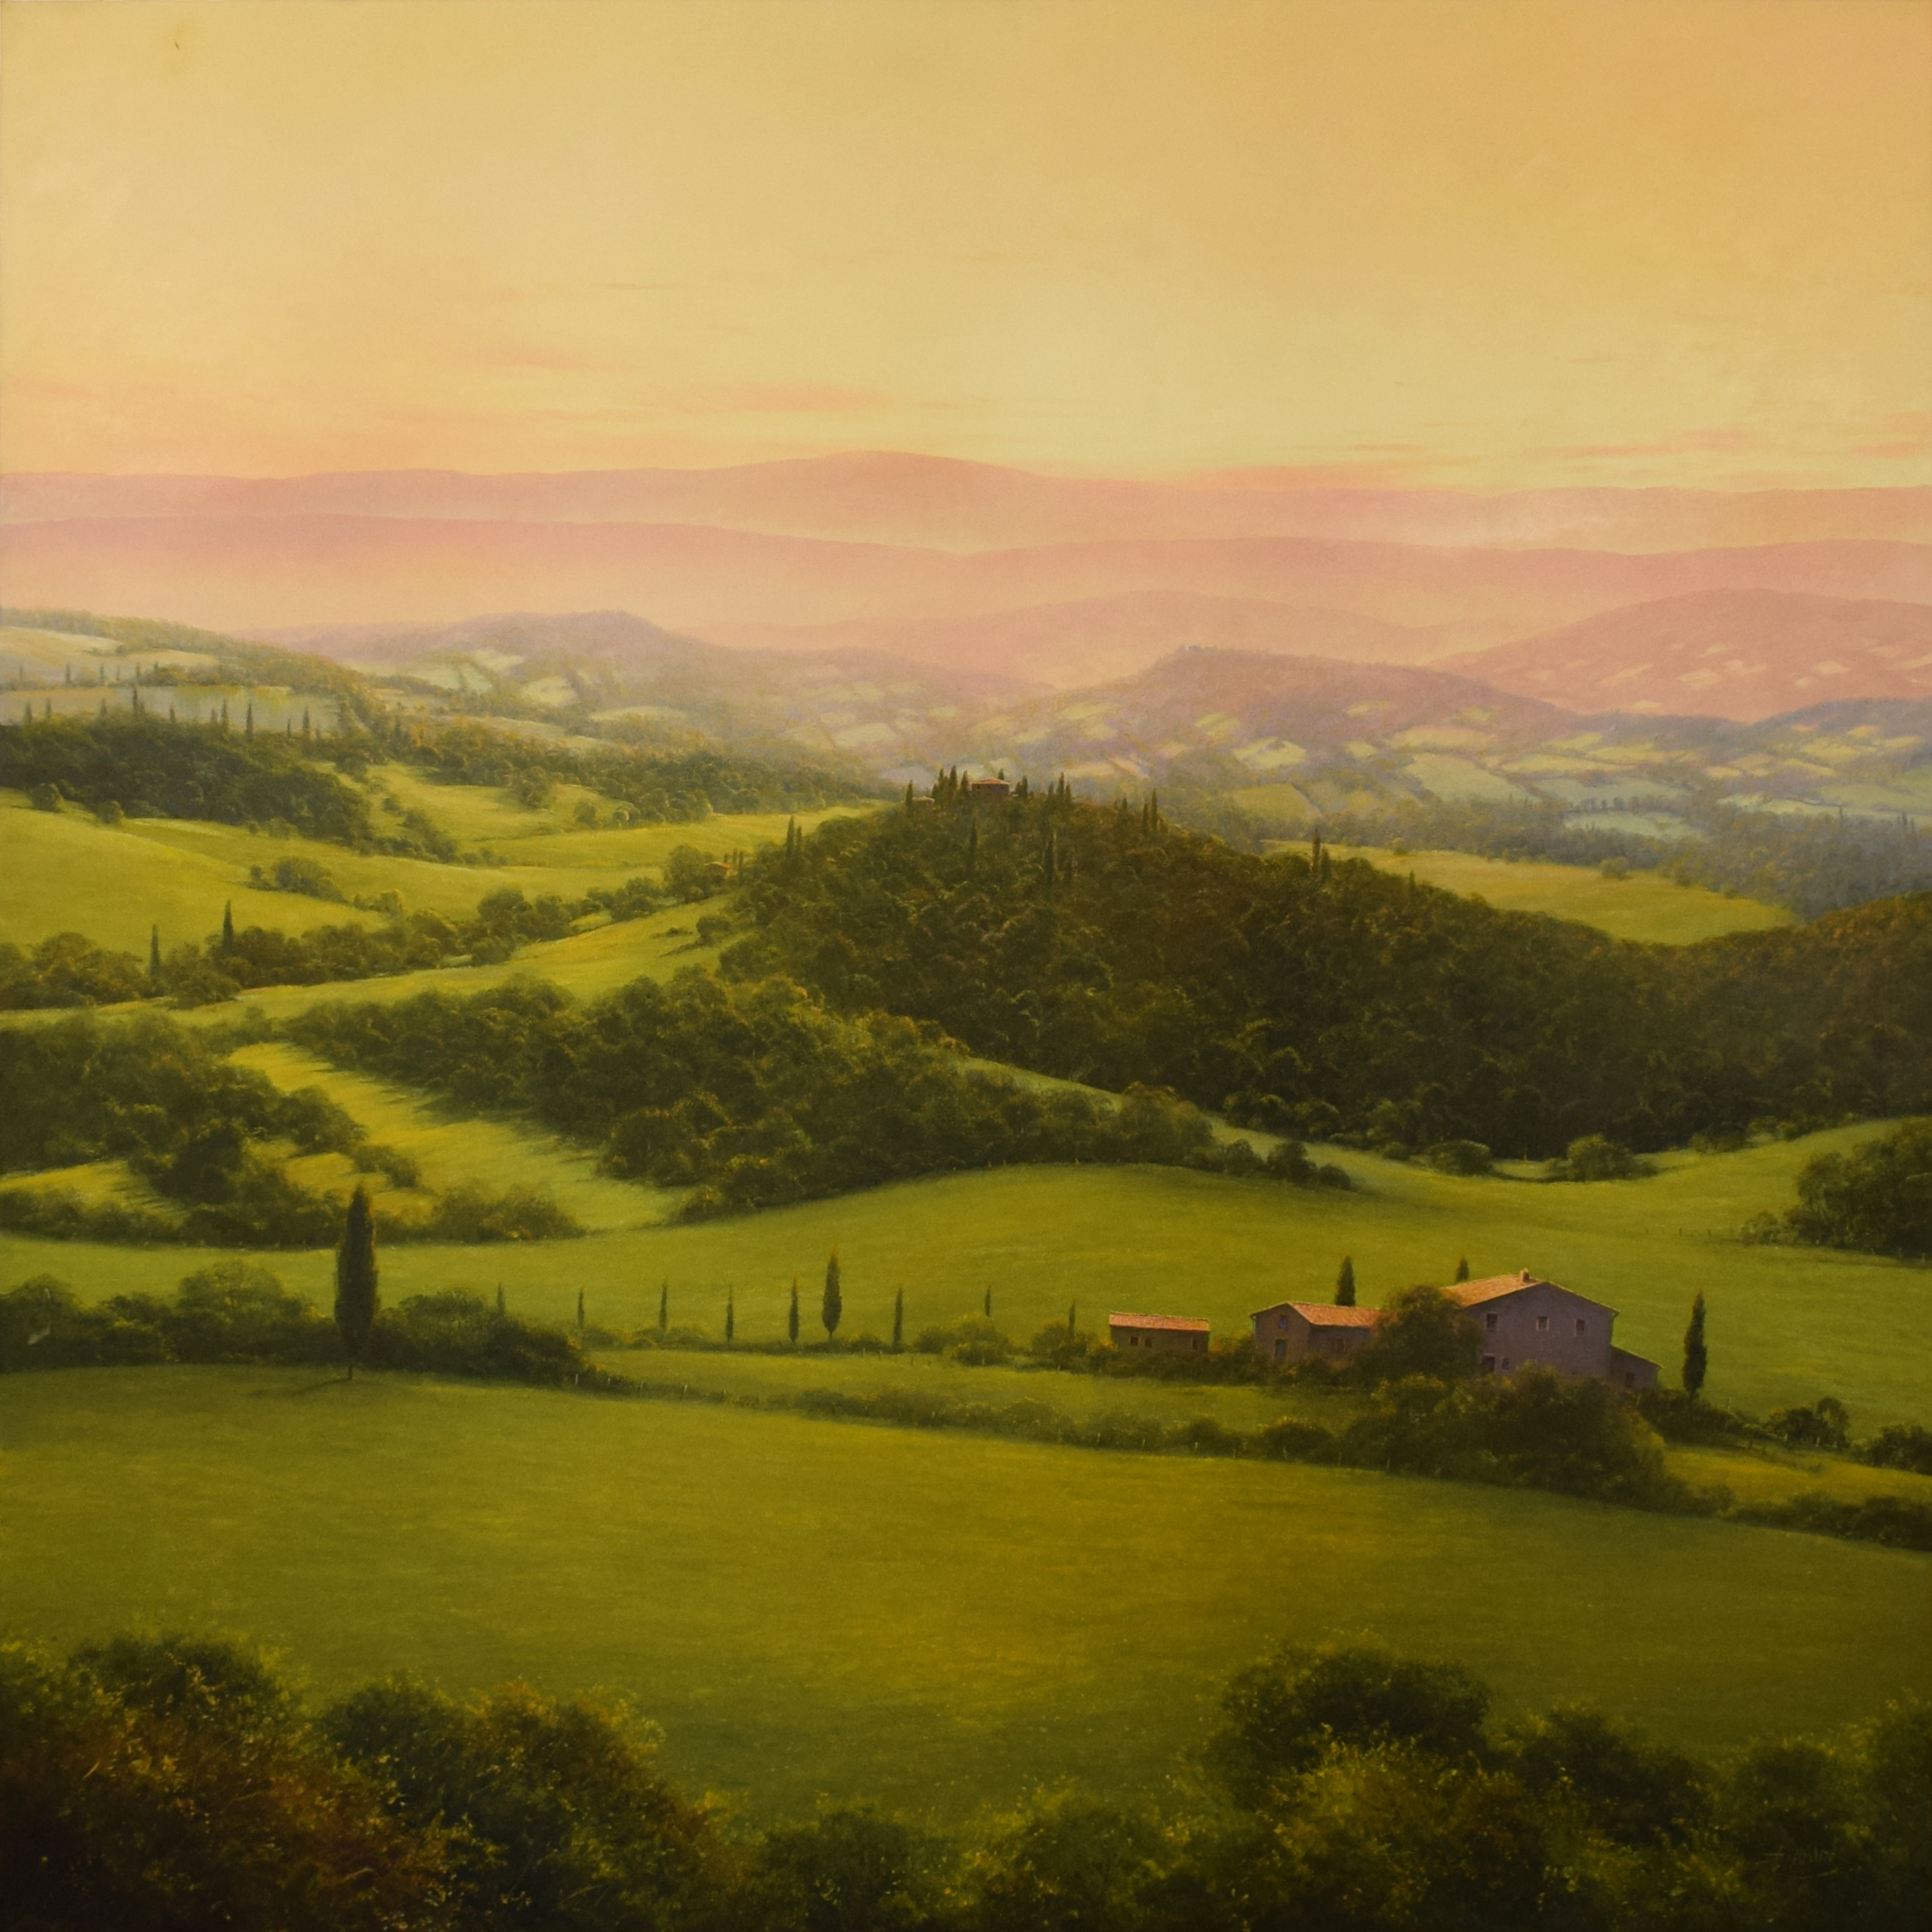 Detlef Rahn - Sommer in der Toskana , 7840-006-675